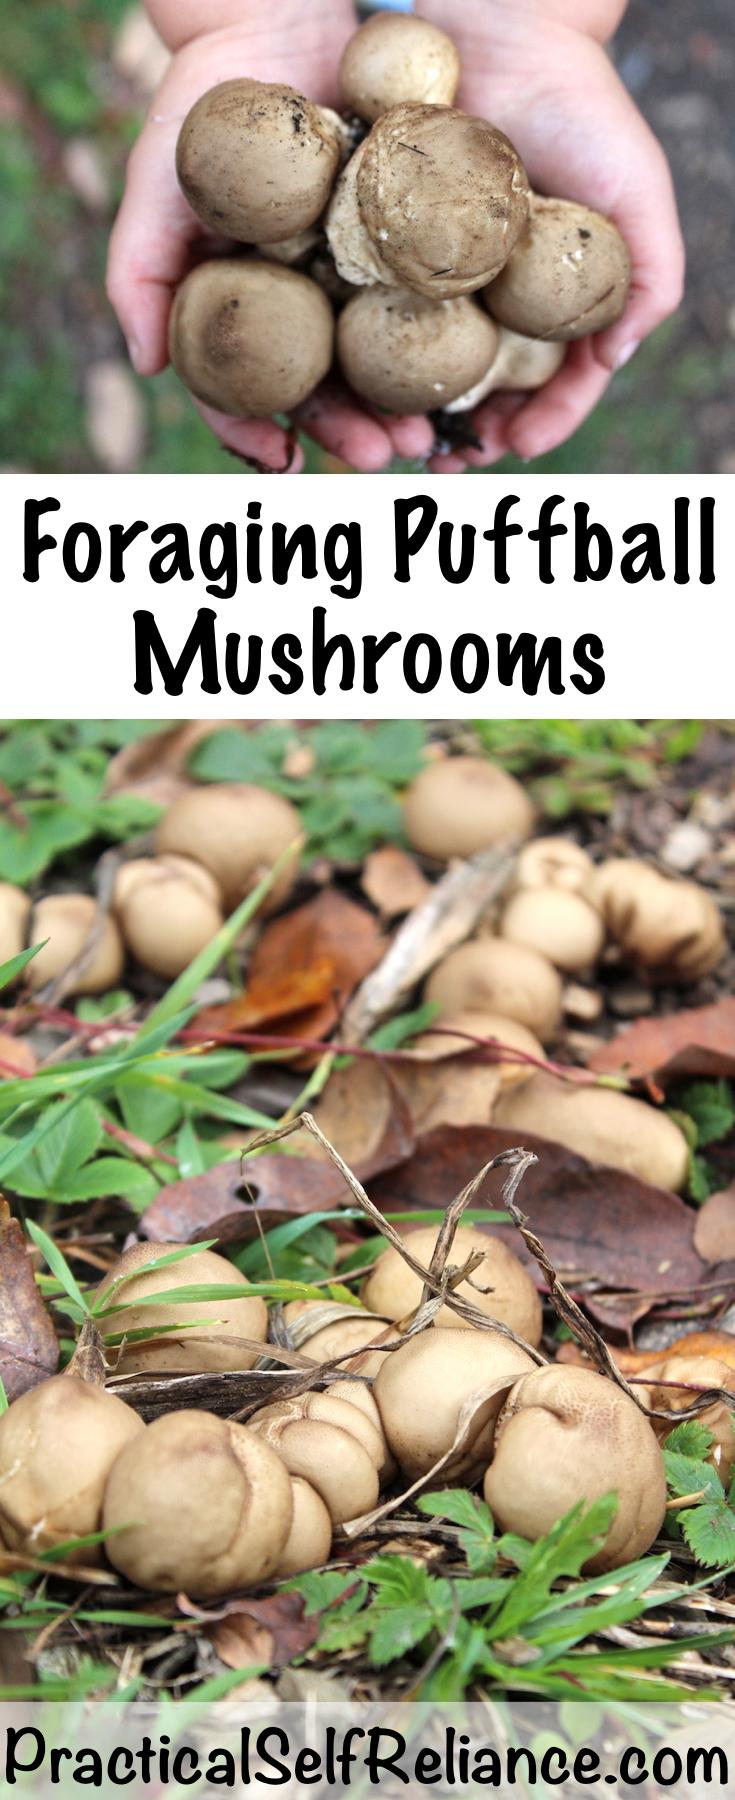 Foraging Puffball Mushrooms